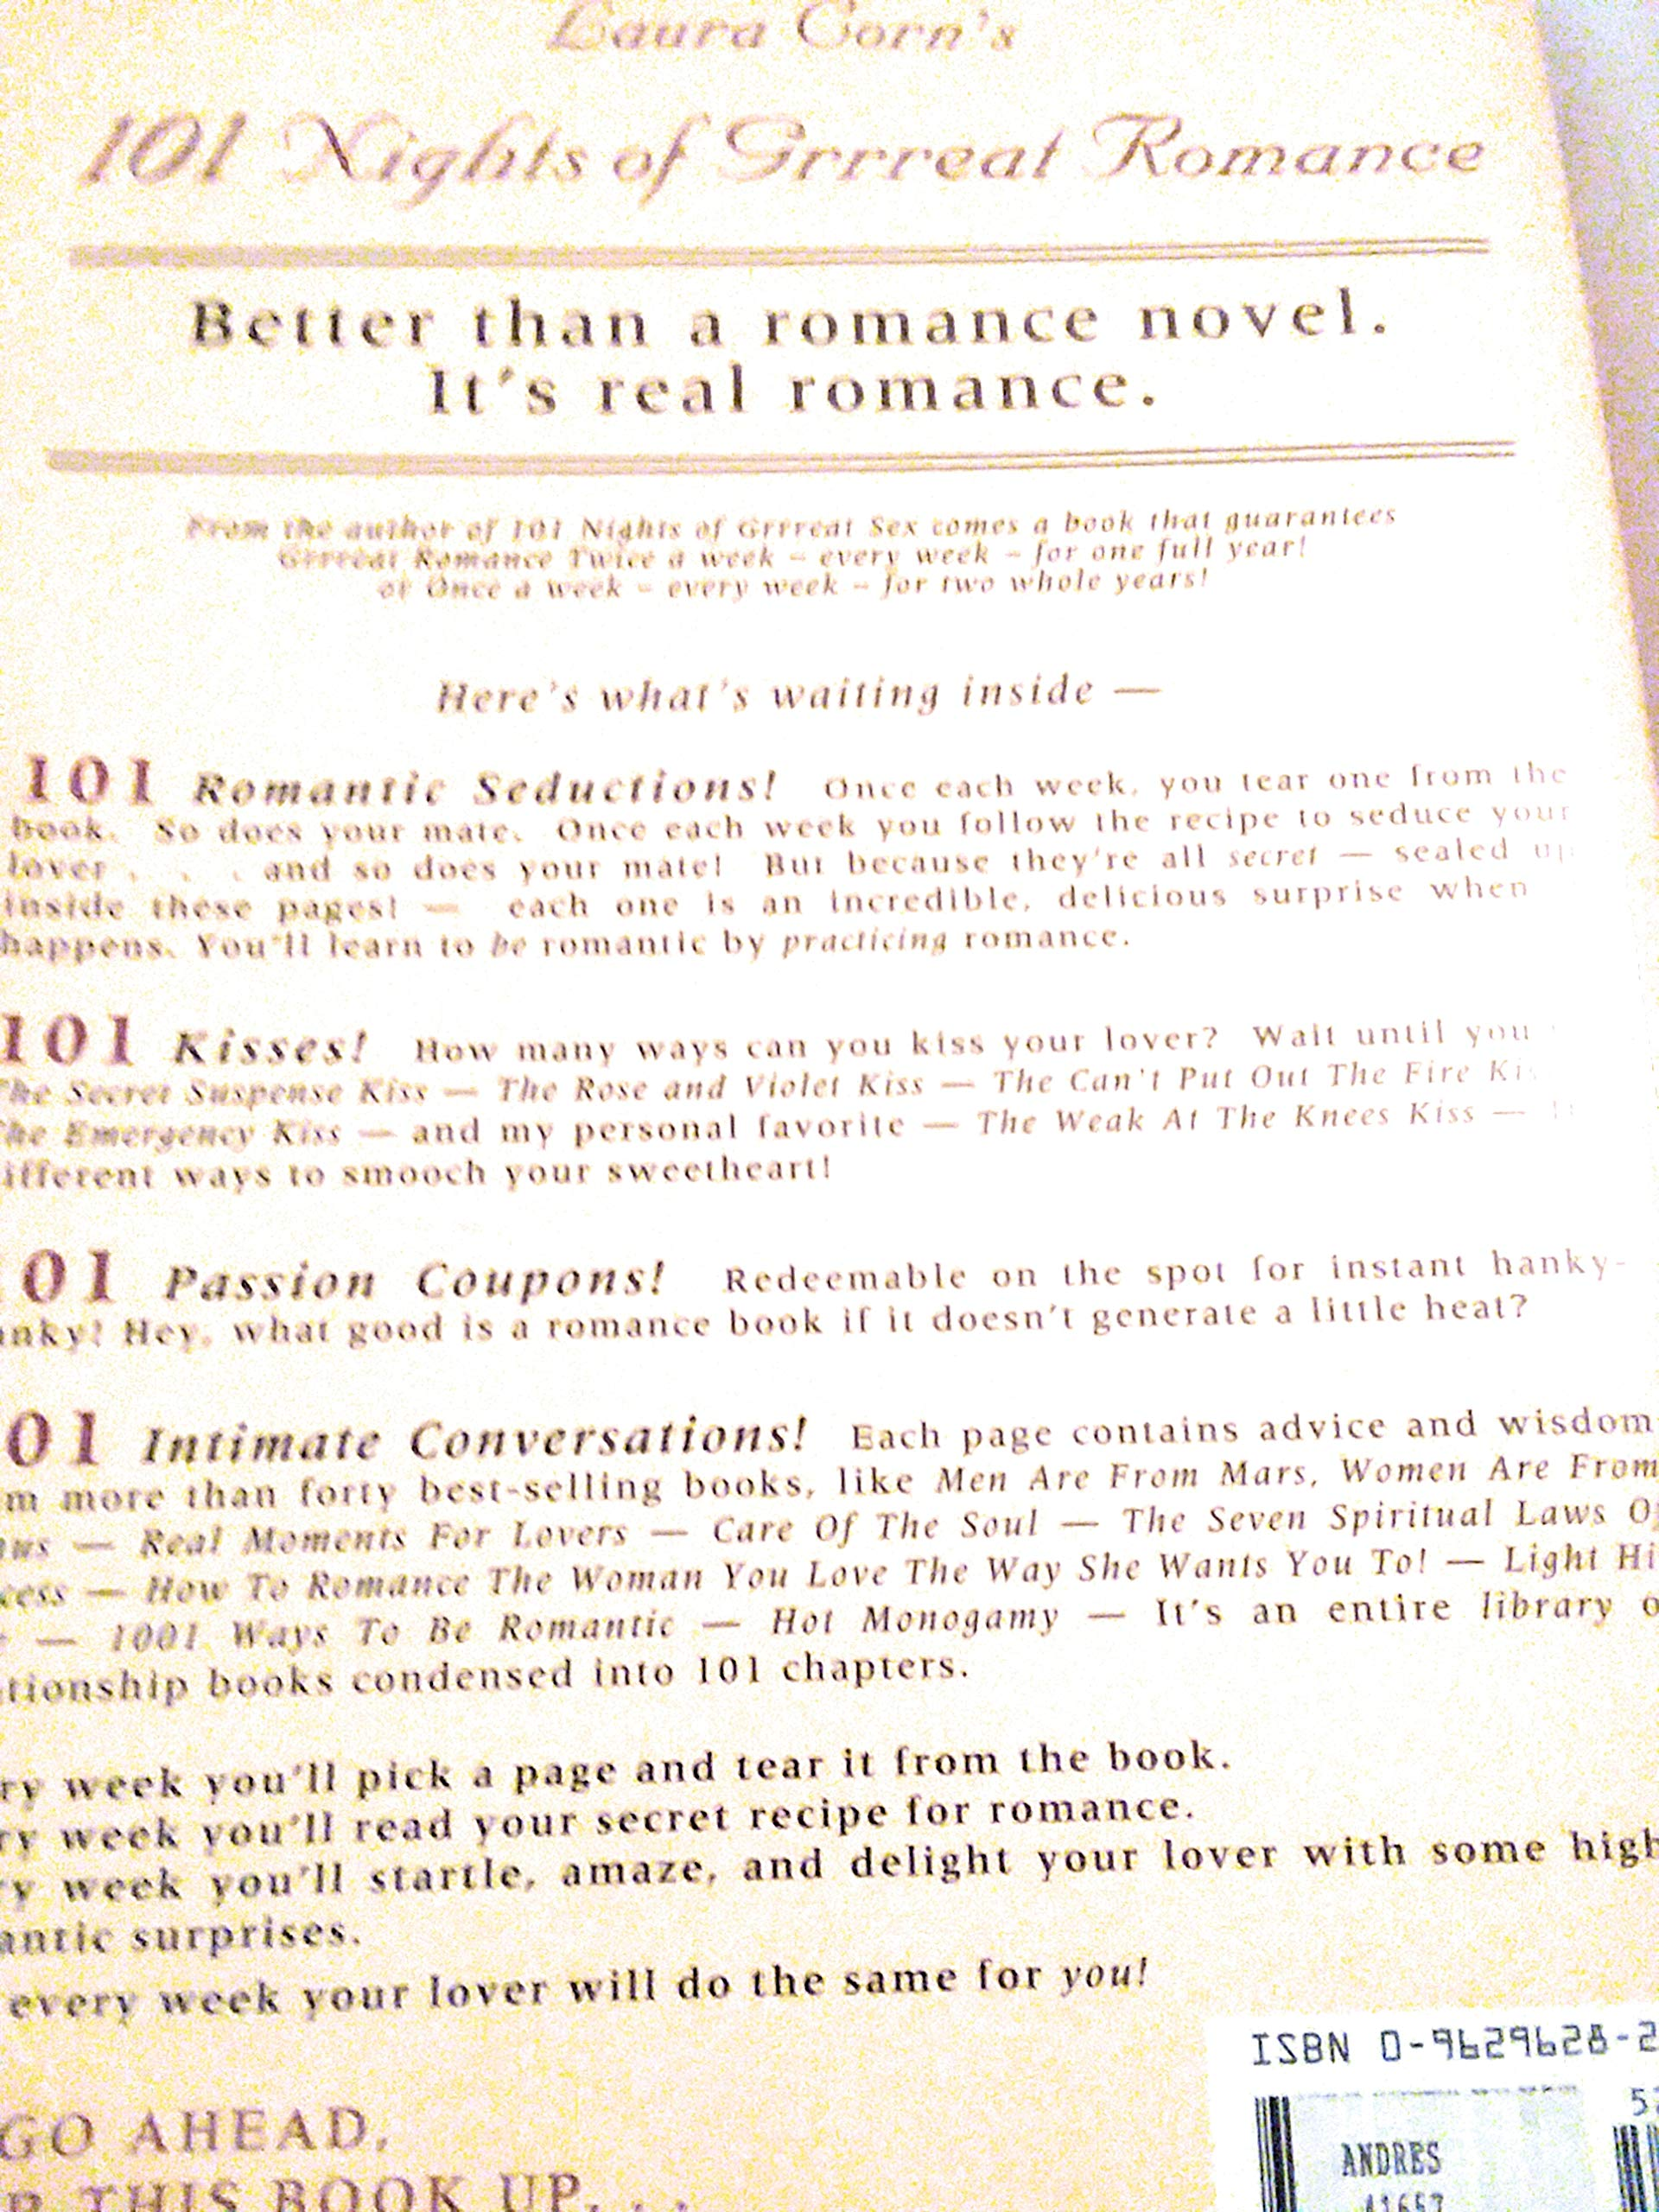 101 Nights of Grrreat Romance: Laura Corn: Amazon com: Books